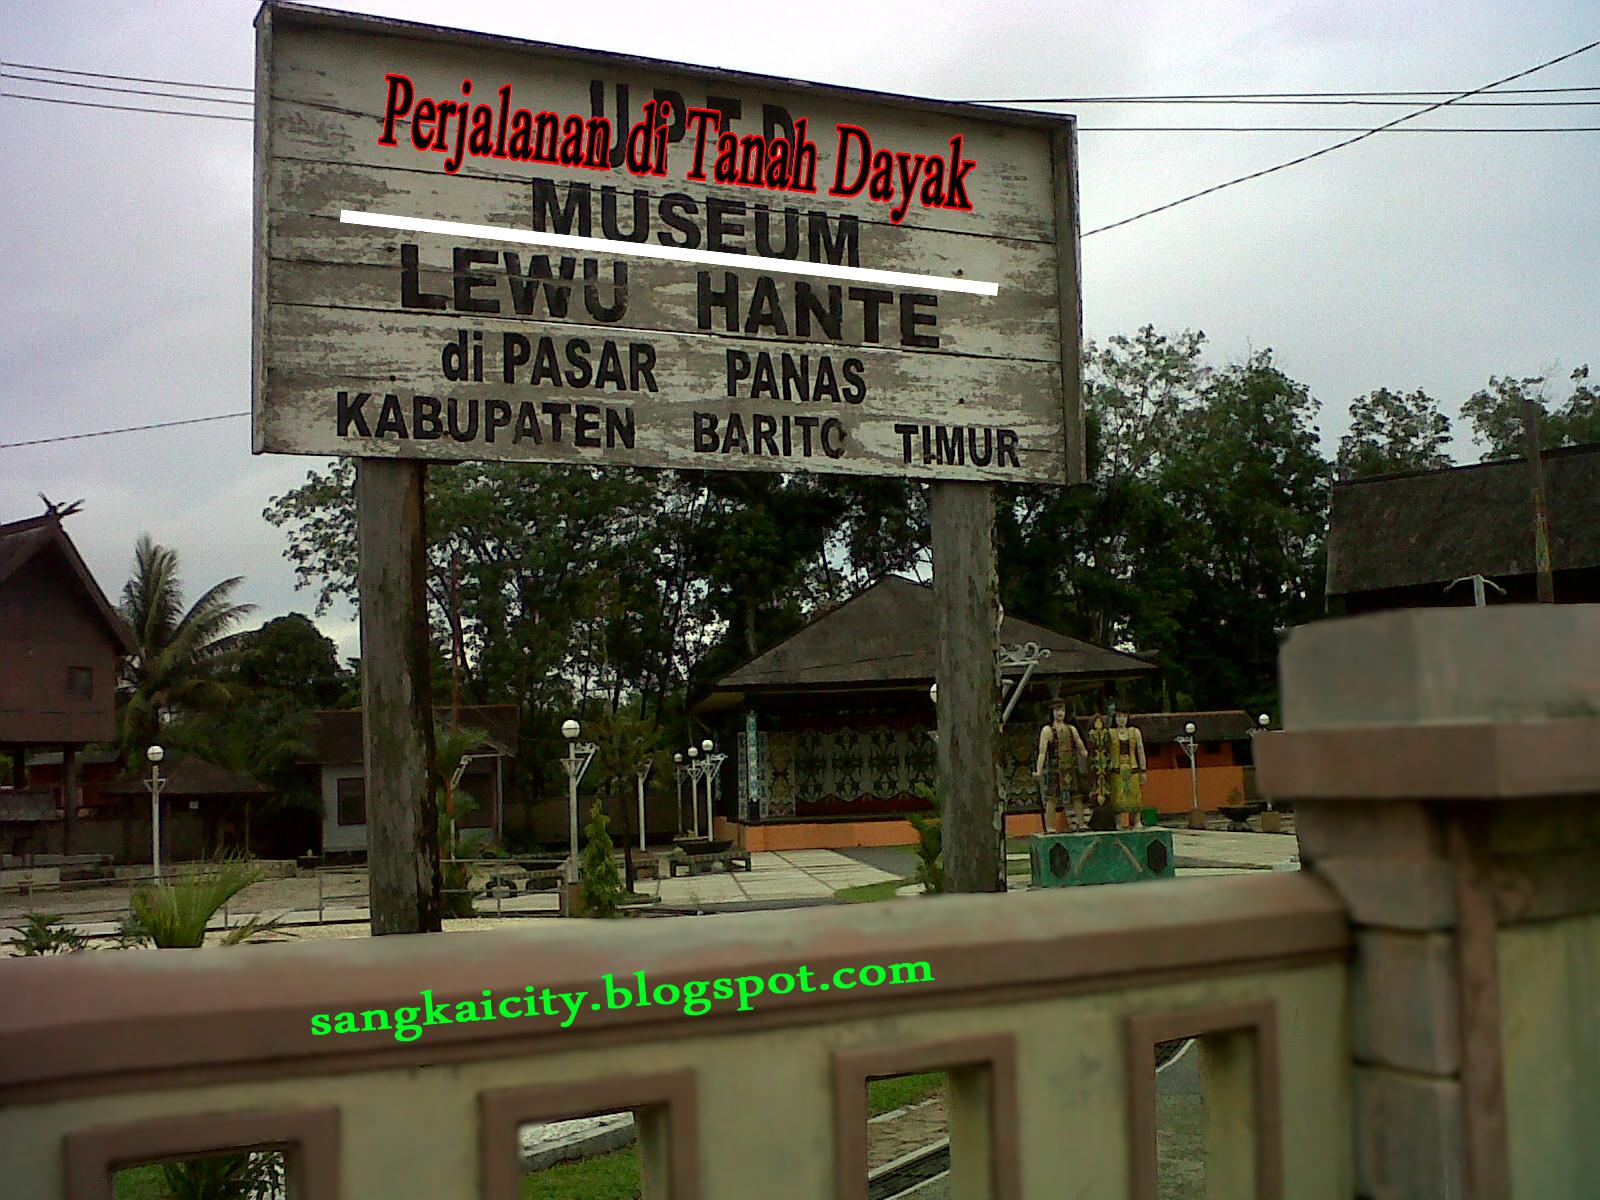 Objek Wisata Museum Lewu Hante Pasar Panas Bar Tim Sangkay